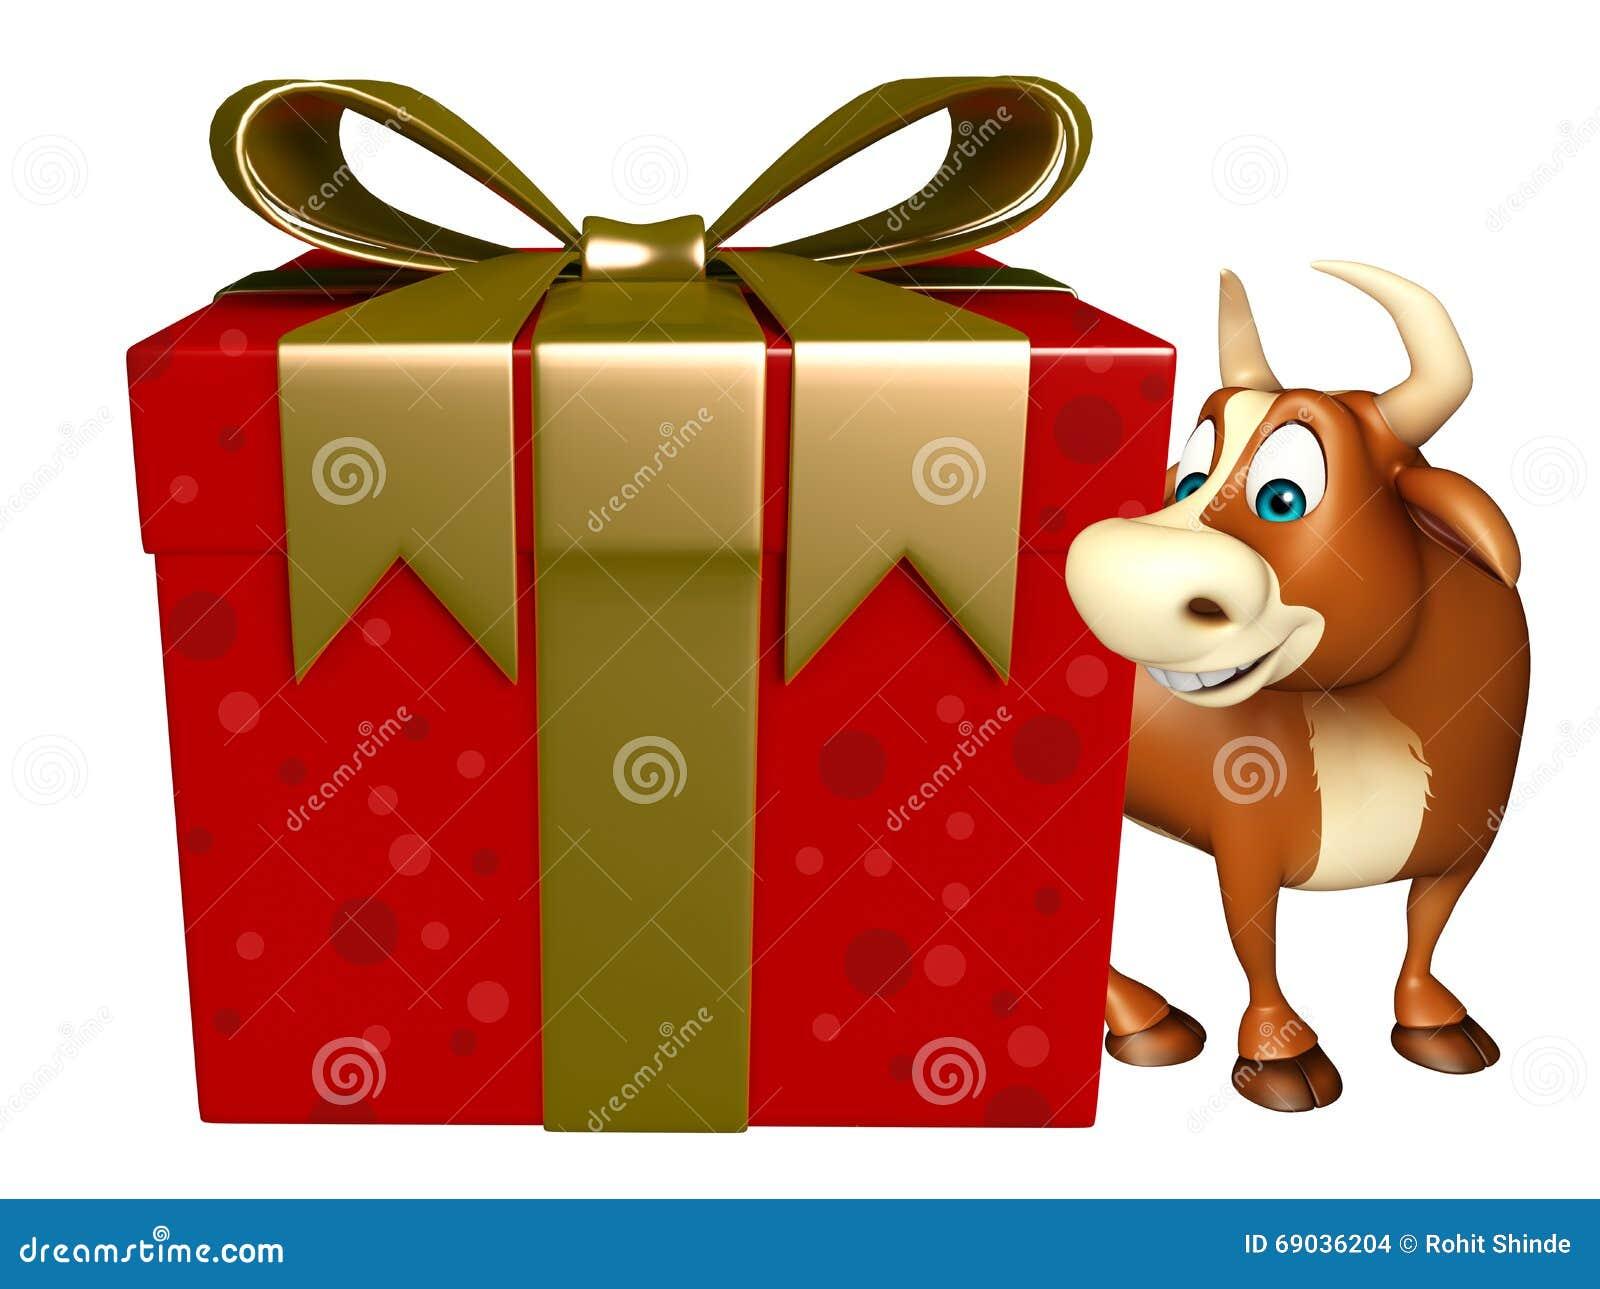 Personaje De Dibujos Animados De Bull Con La Caja De Regalo Stock De